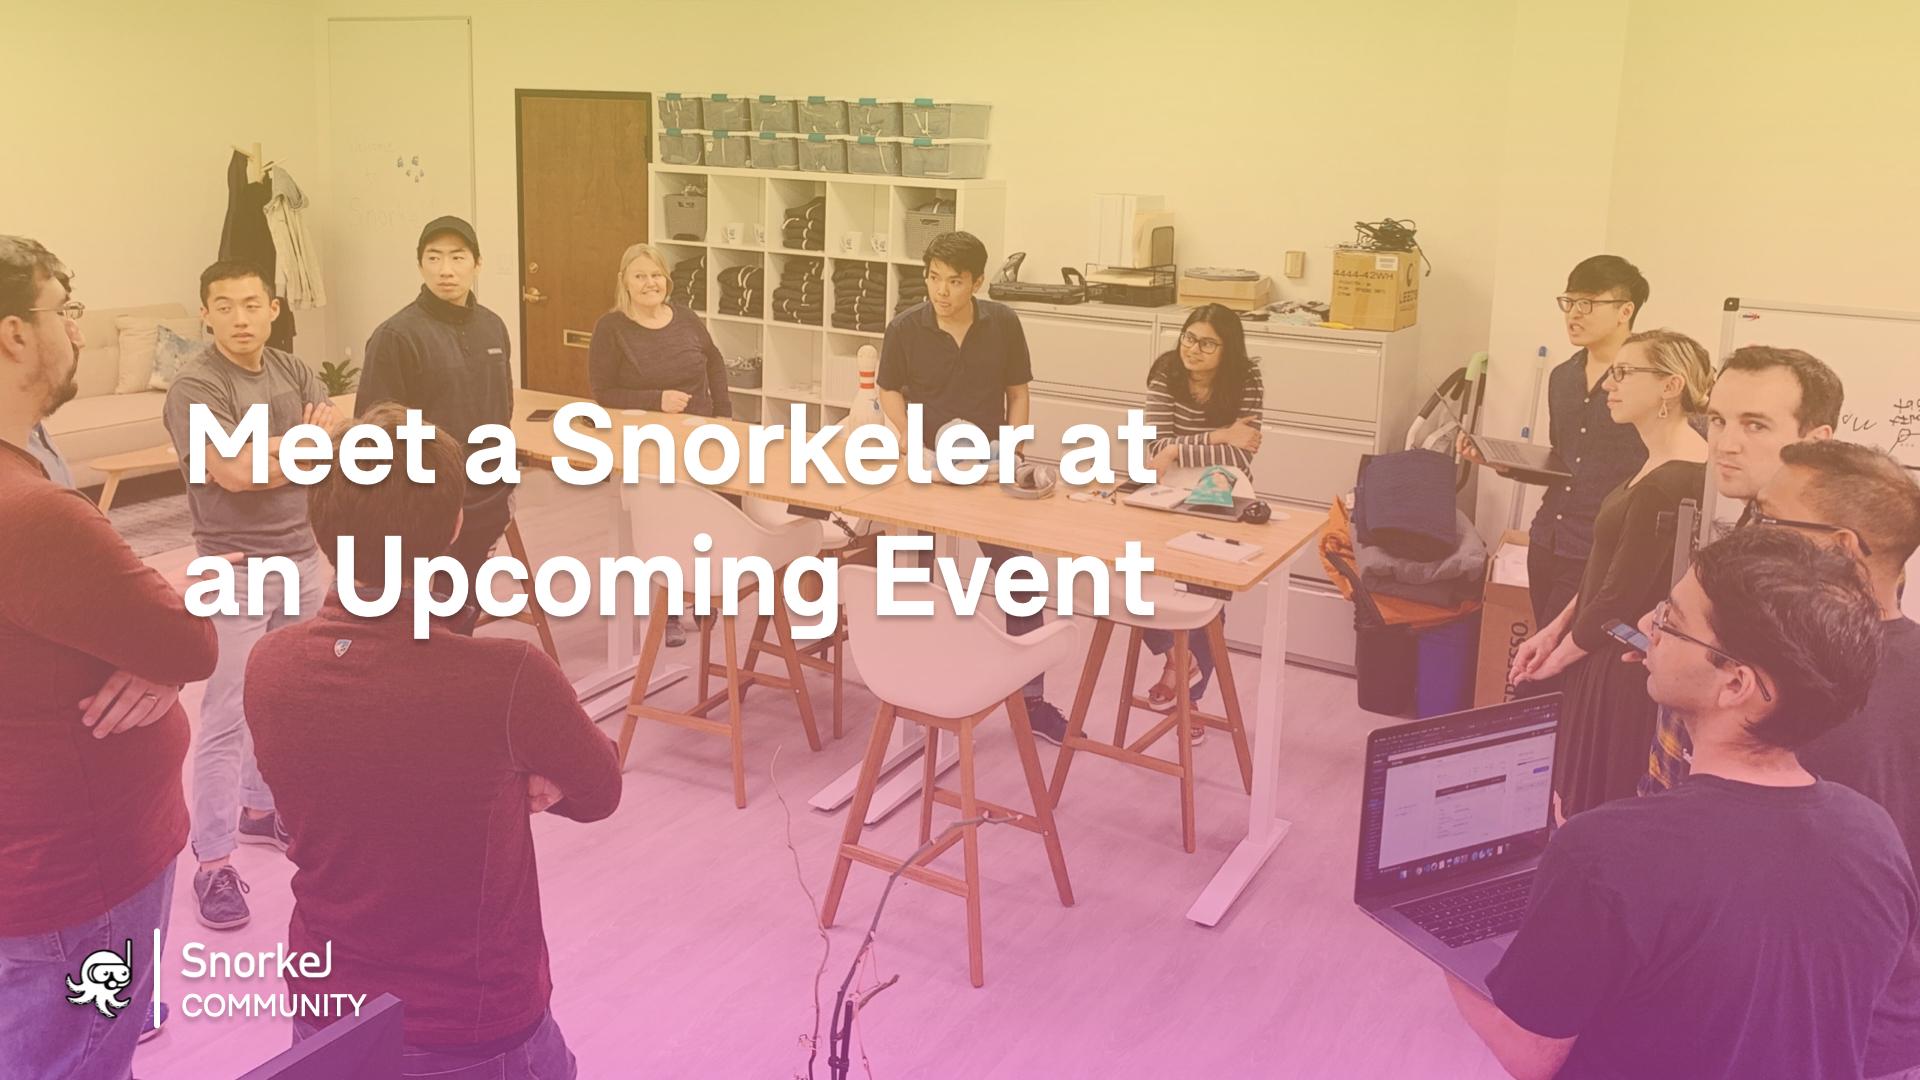 Meet a Snorkeler at an Upcoming Event